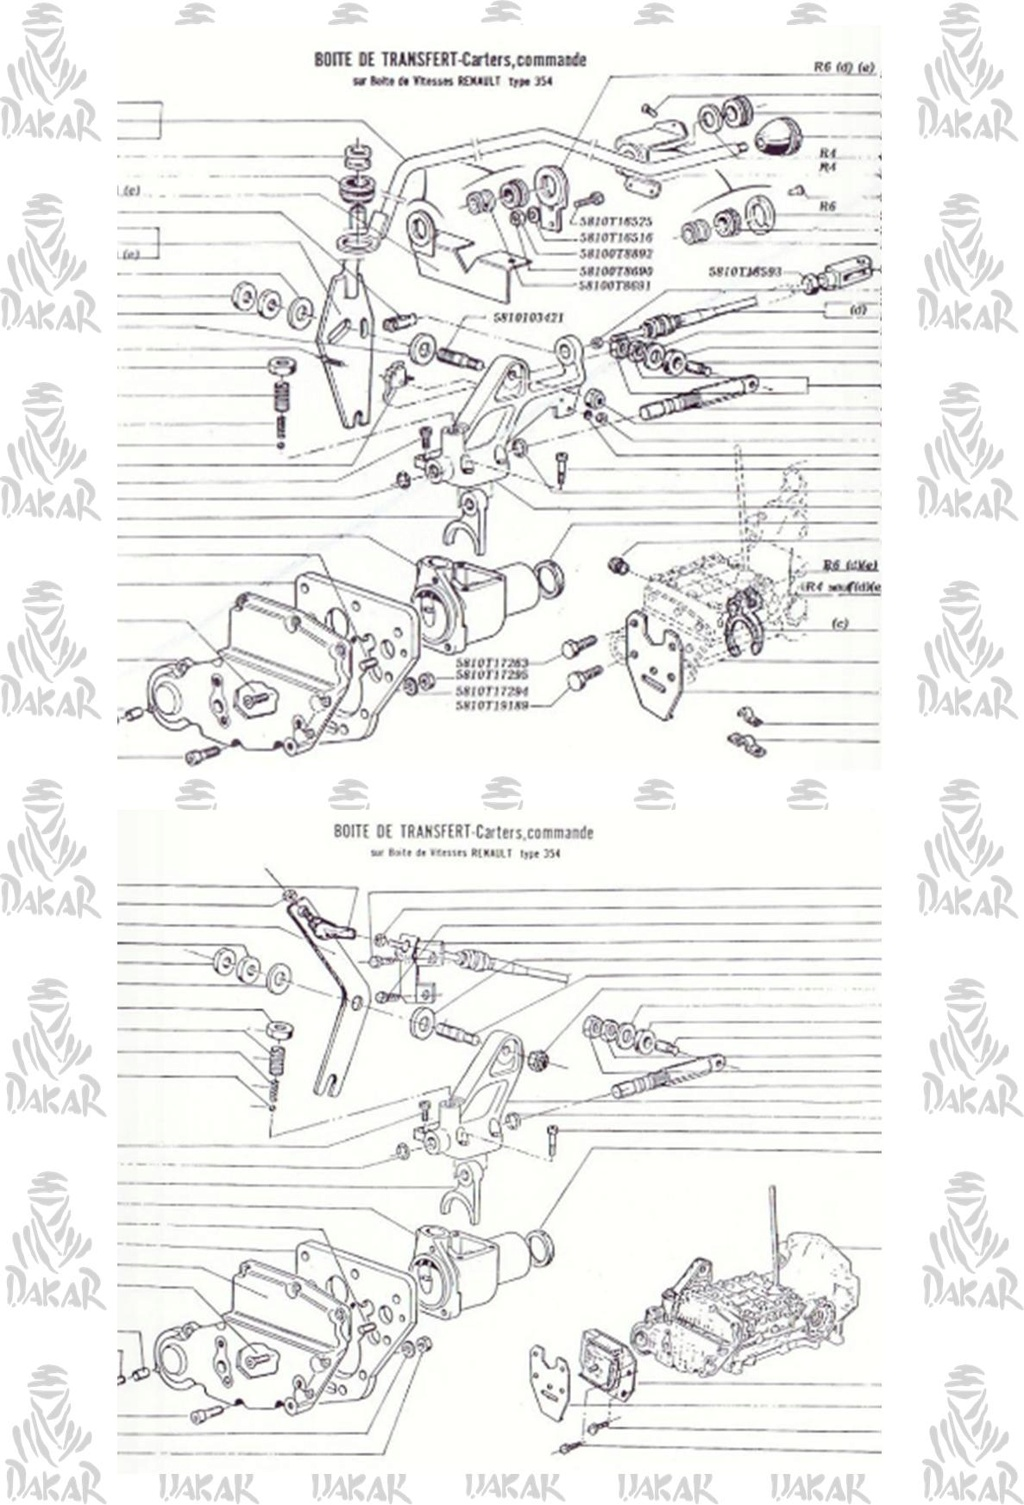 [1/24]Renault 4 l dakar 1980 Ref 80759 1611